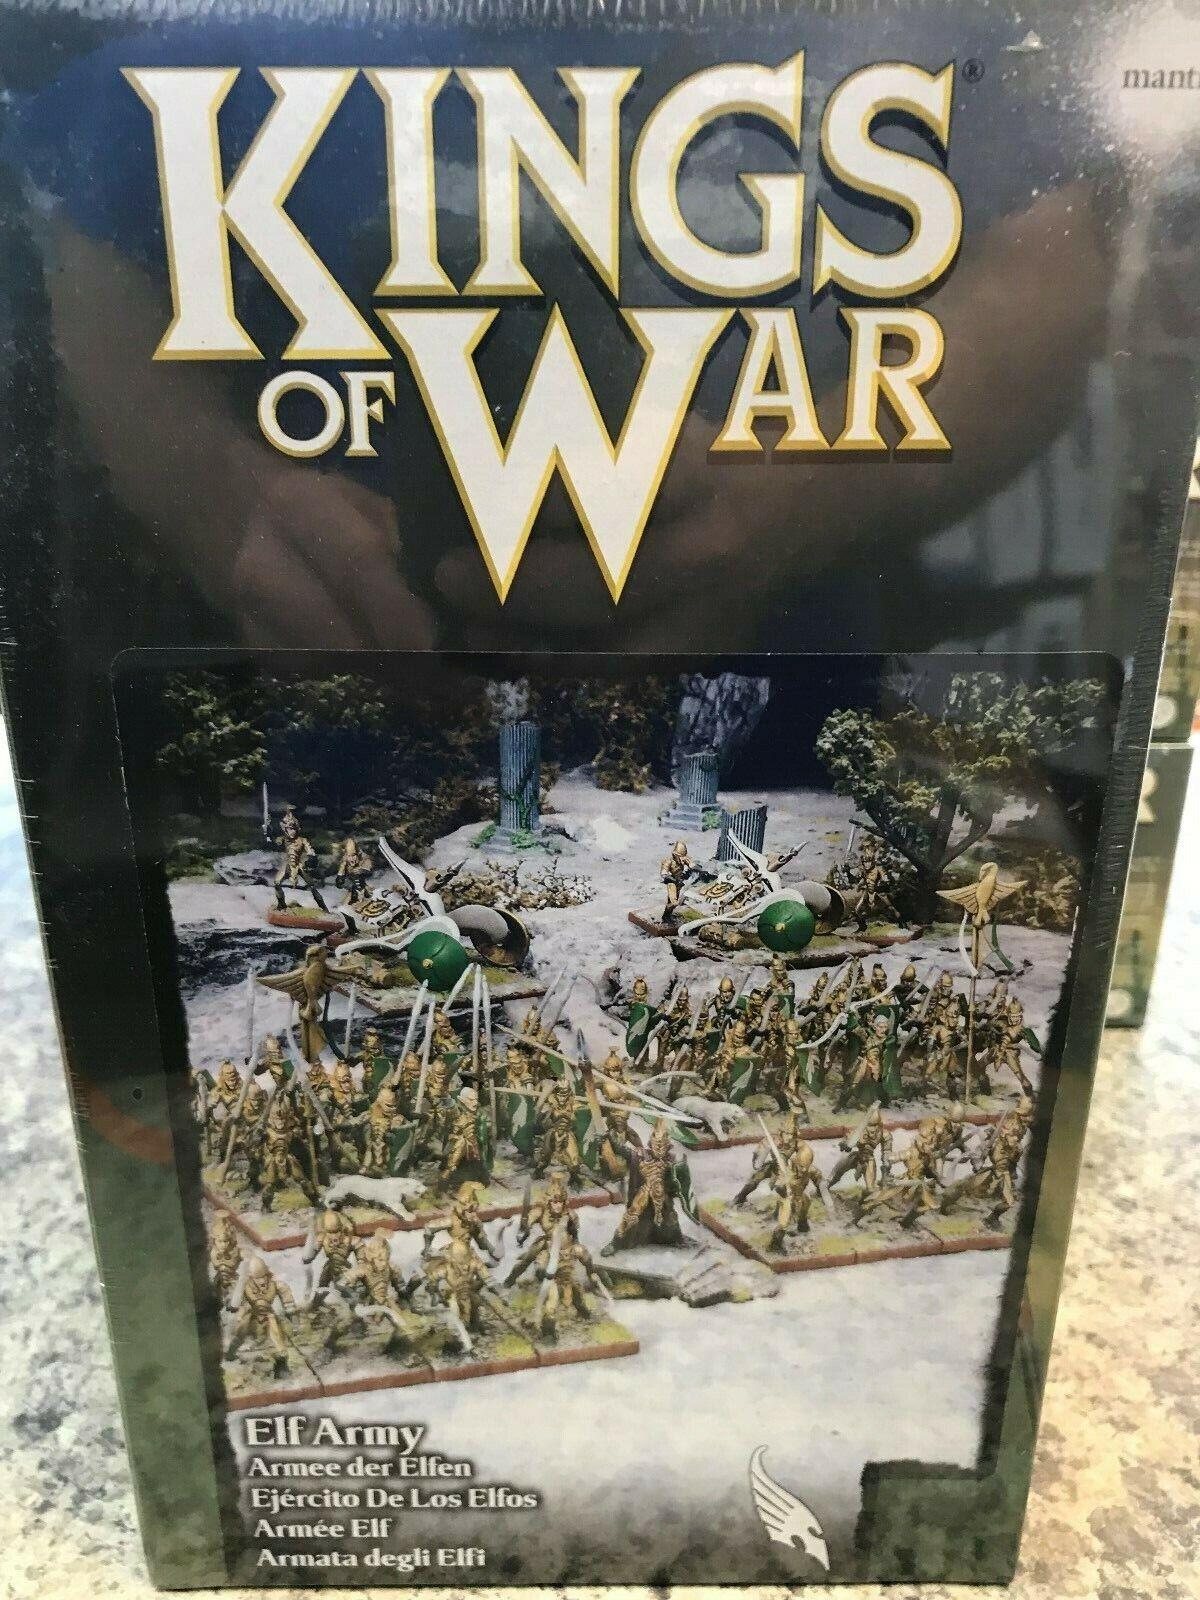 Elf Army Starter Set Mantic Miniatures Games Kings of War Warlords Erehwon